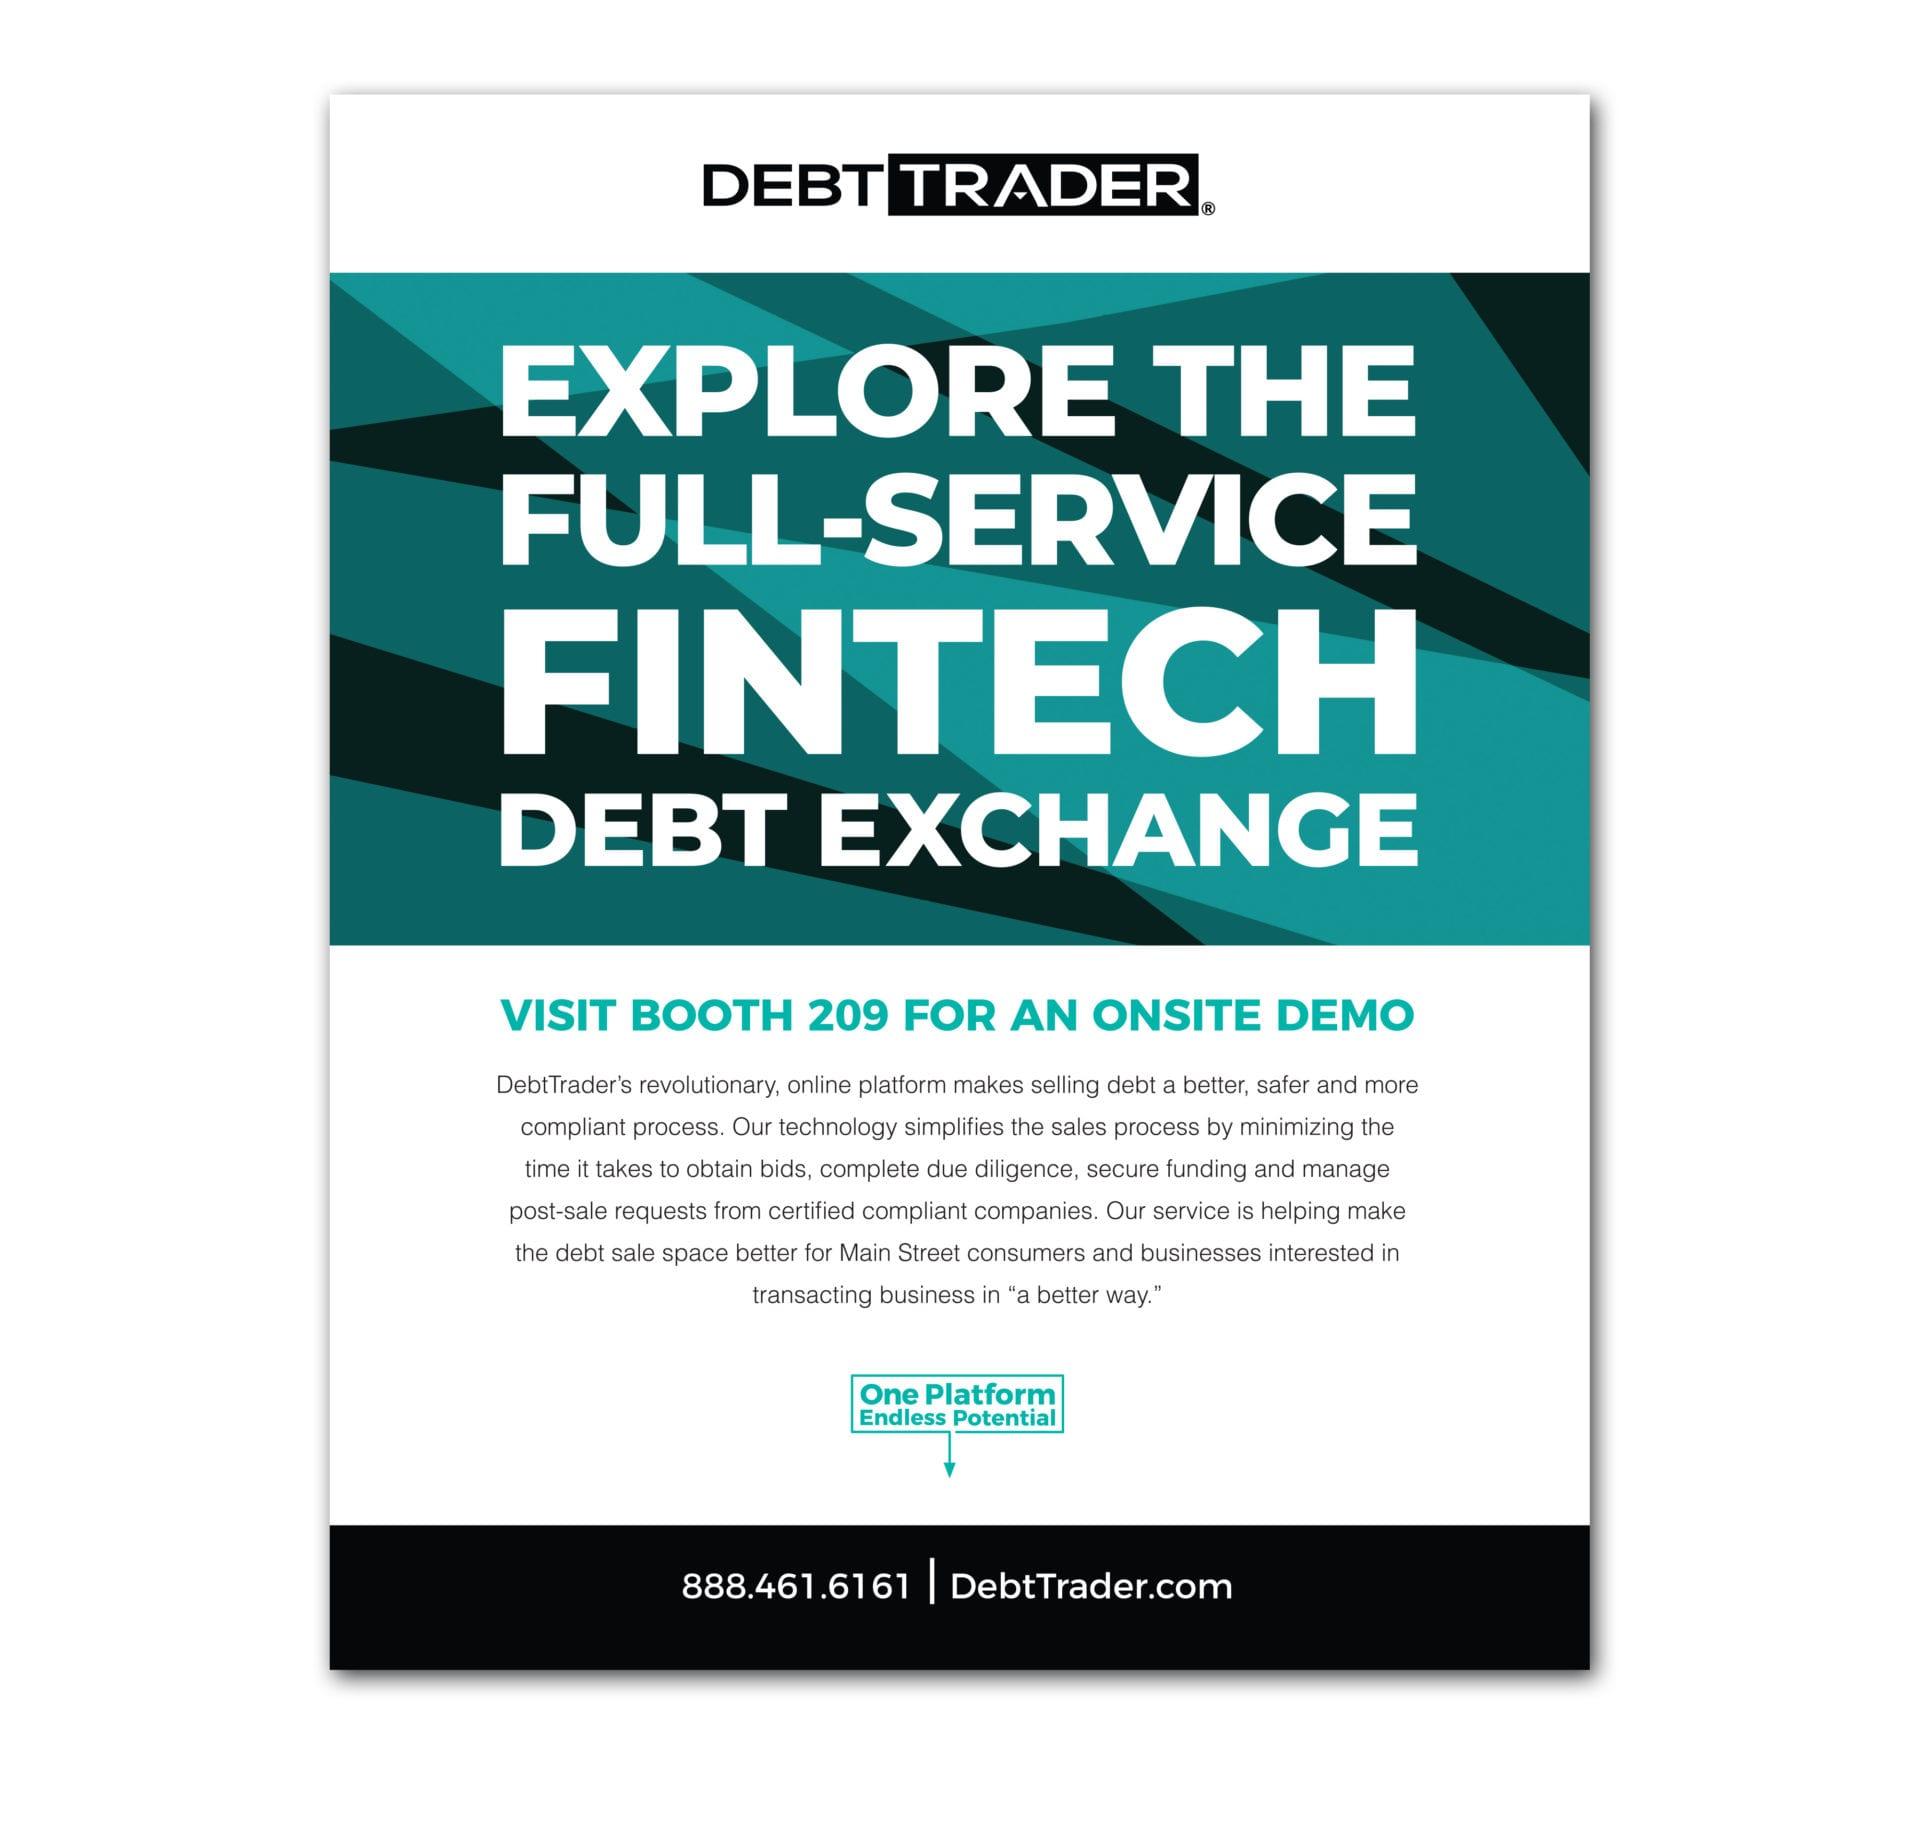 DebtTrader Tradeshow sign